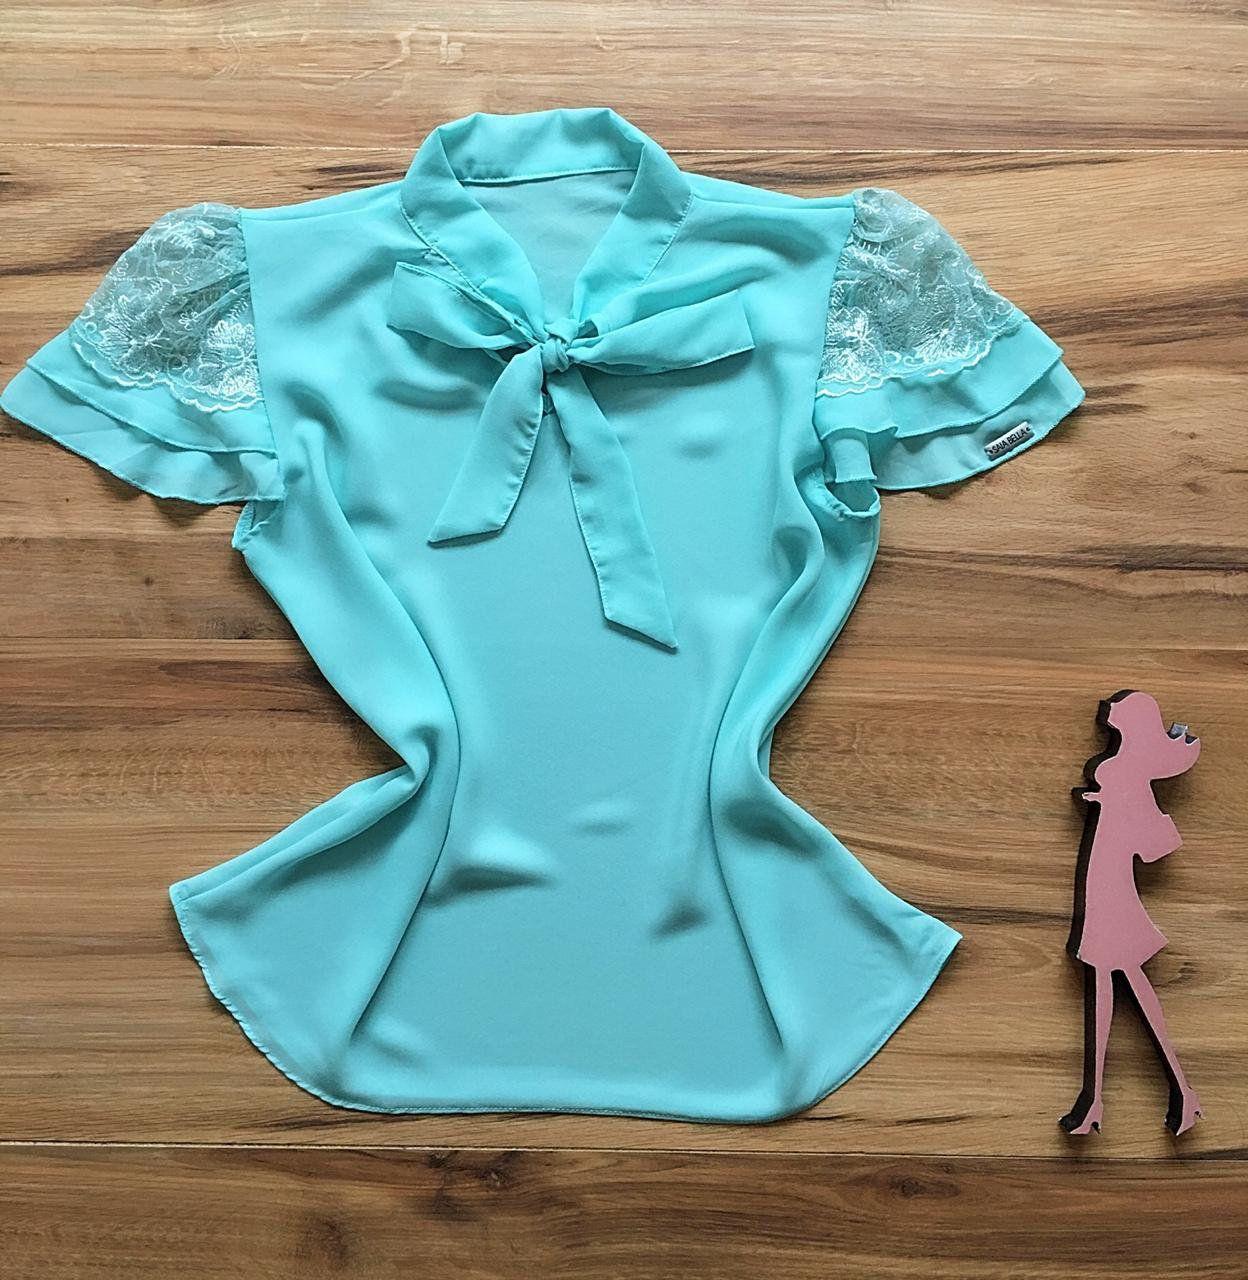 Blusa de Renda Saia Bella - SB9974  azul bebe